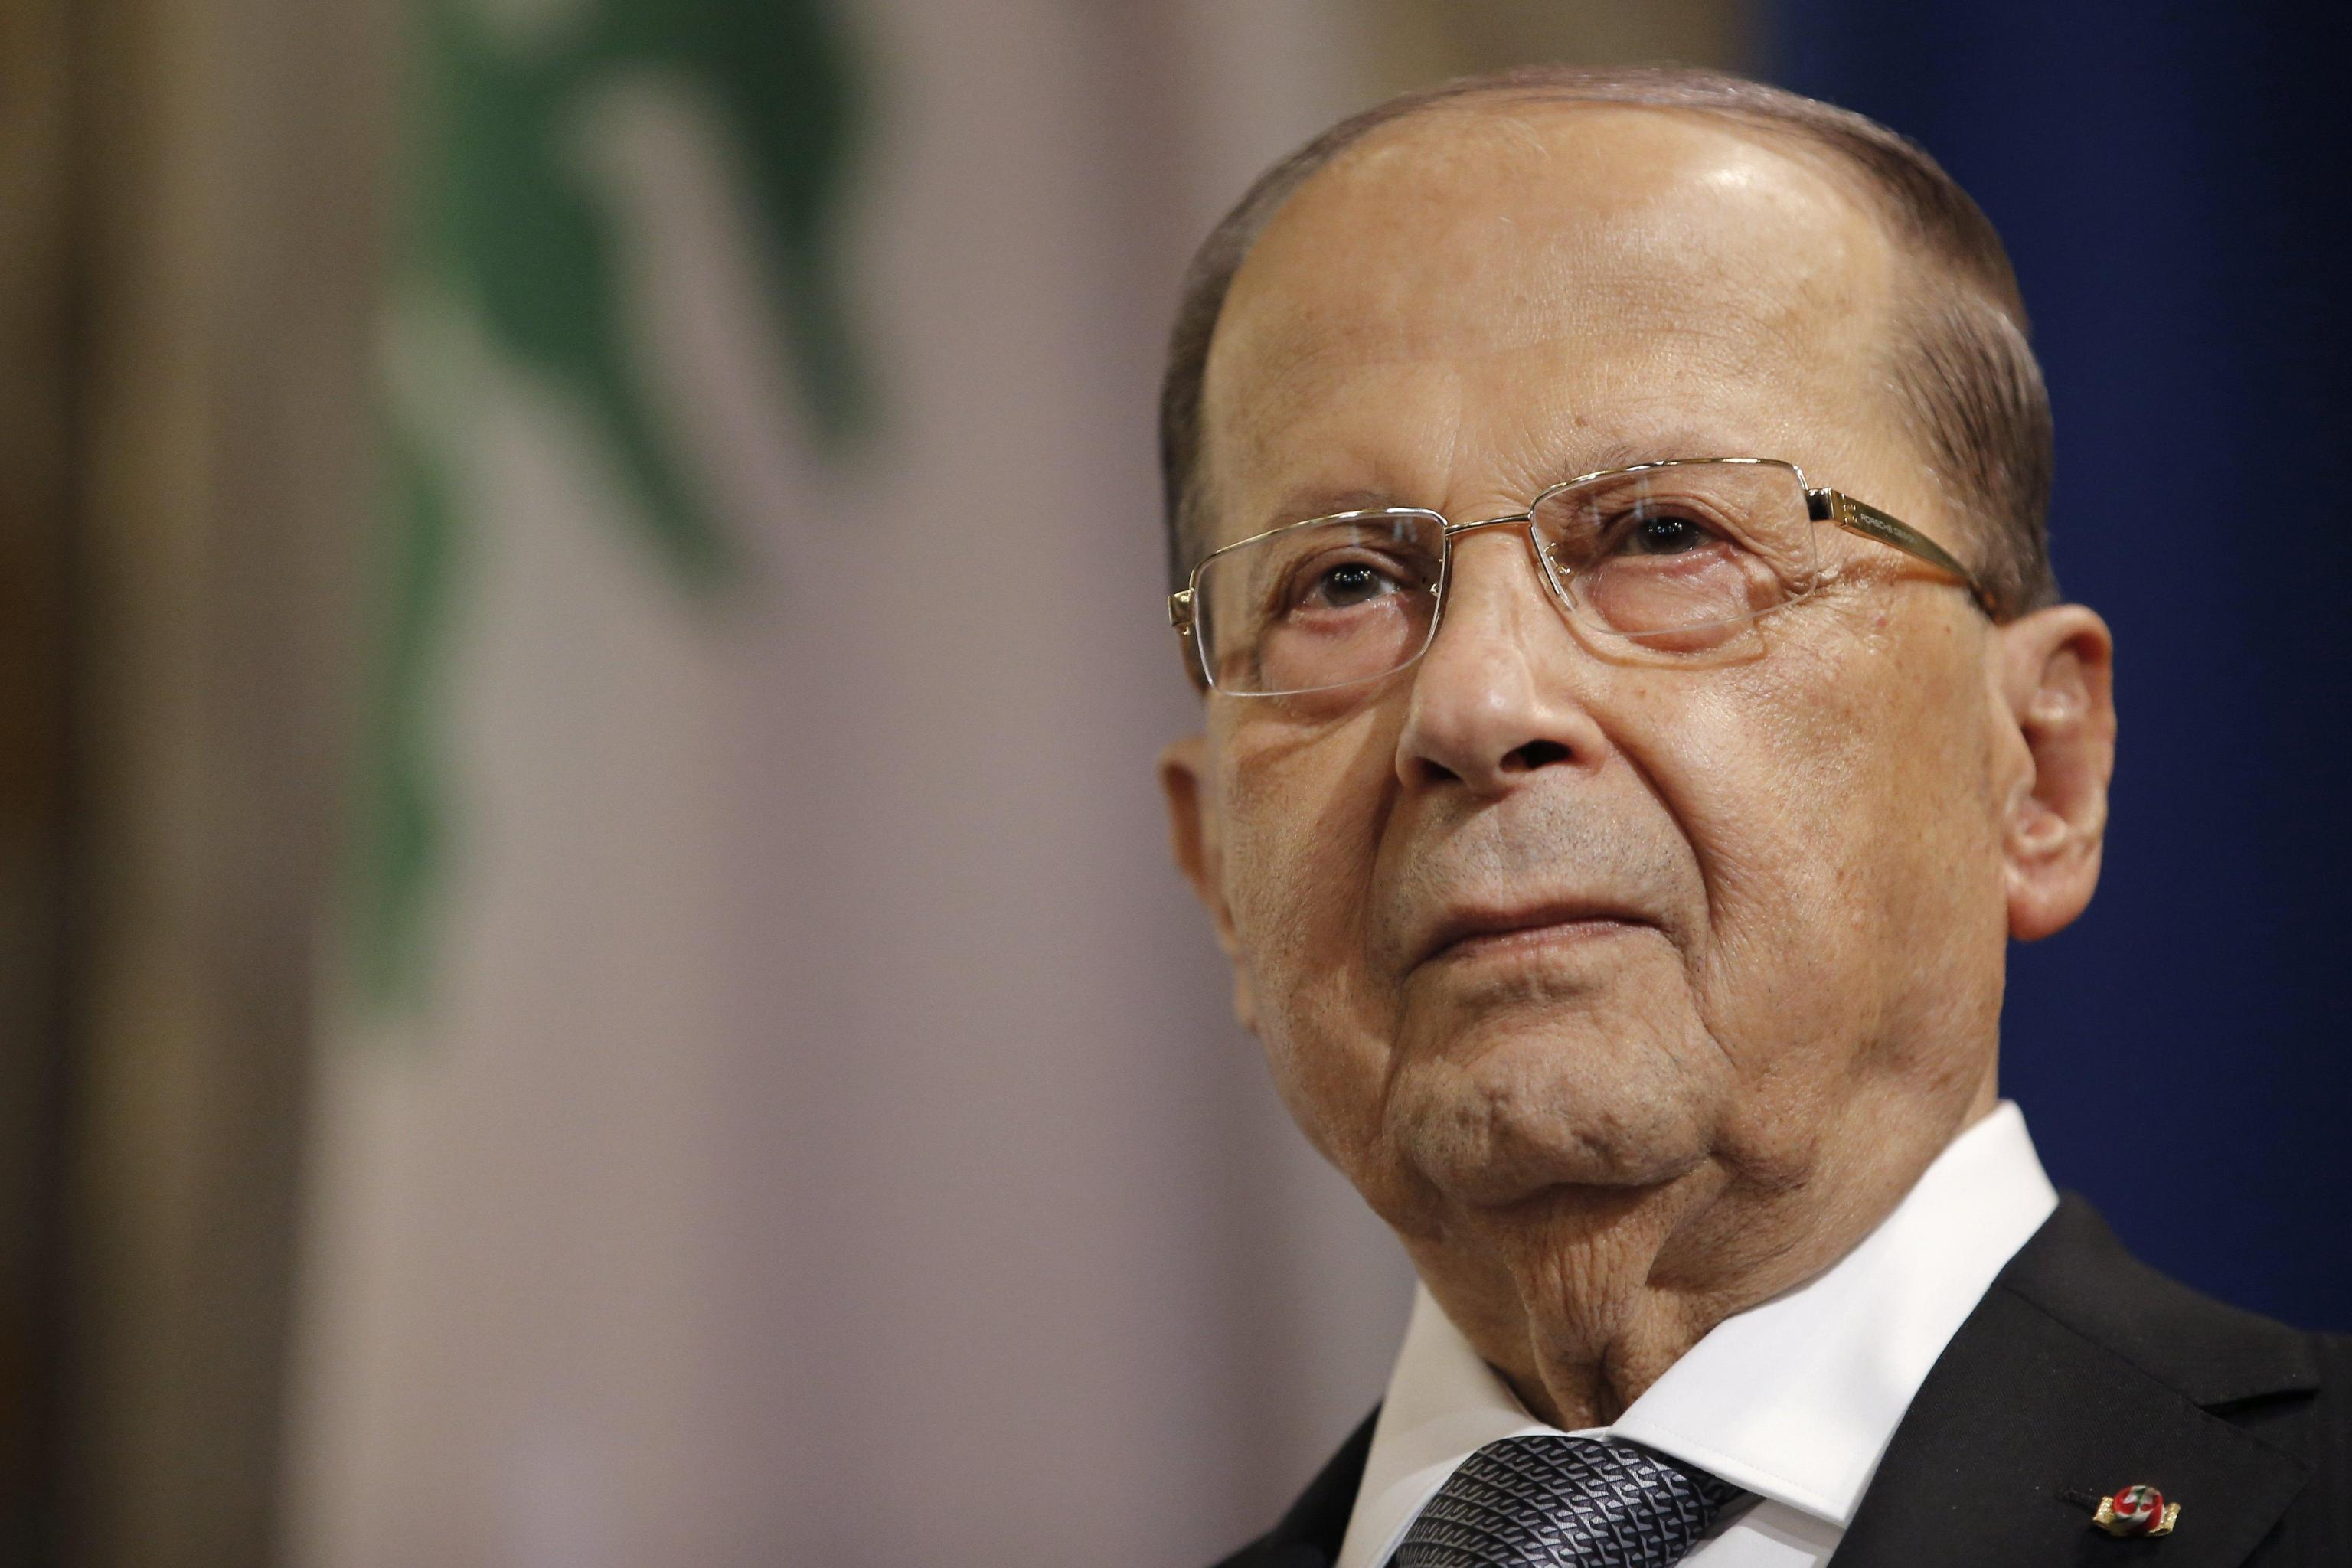 Libano: Aoun, Hariri è detenuto a Riad